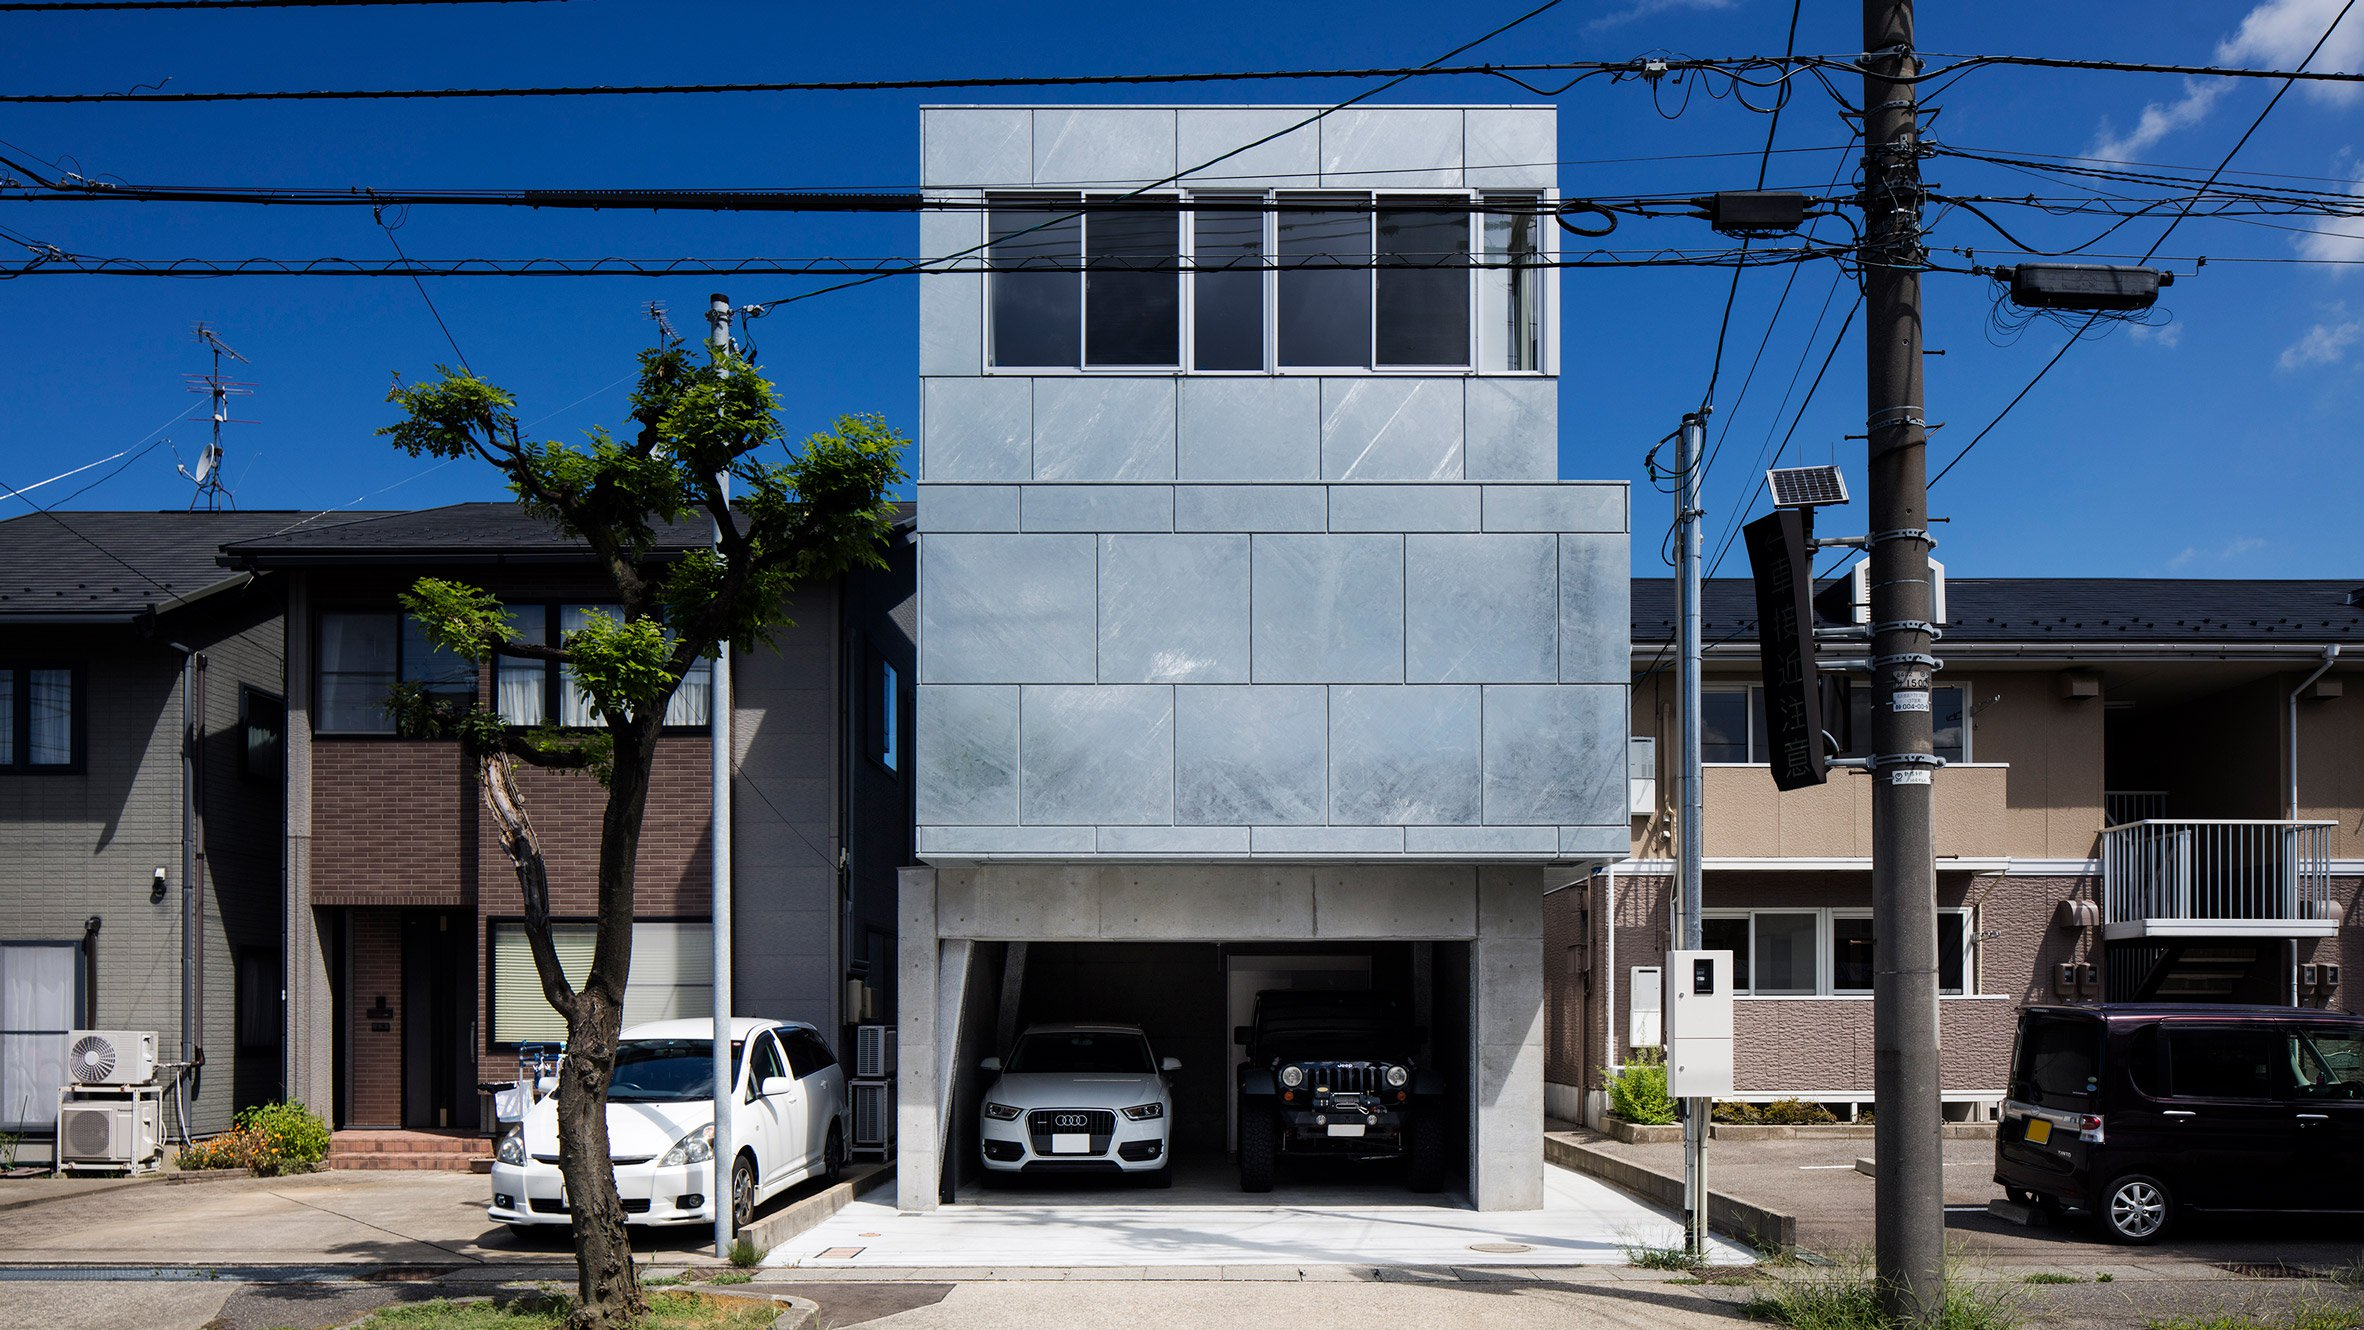 shinbohon-house-k-yuichi-yoshida-associates-architecture-residential-japan-_dezeen_hero-a.jpg